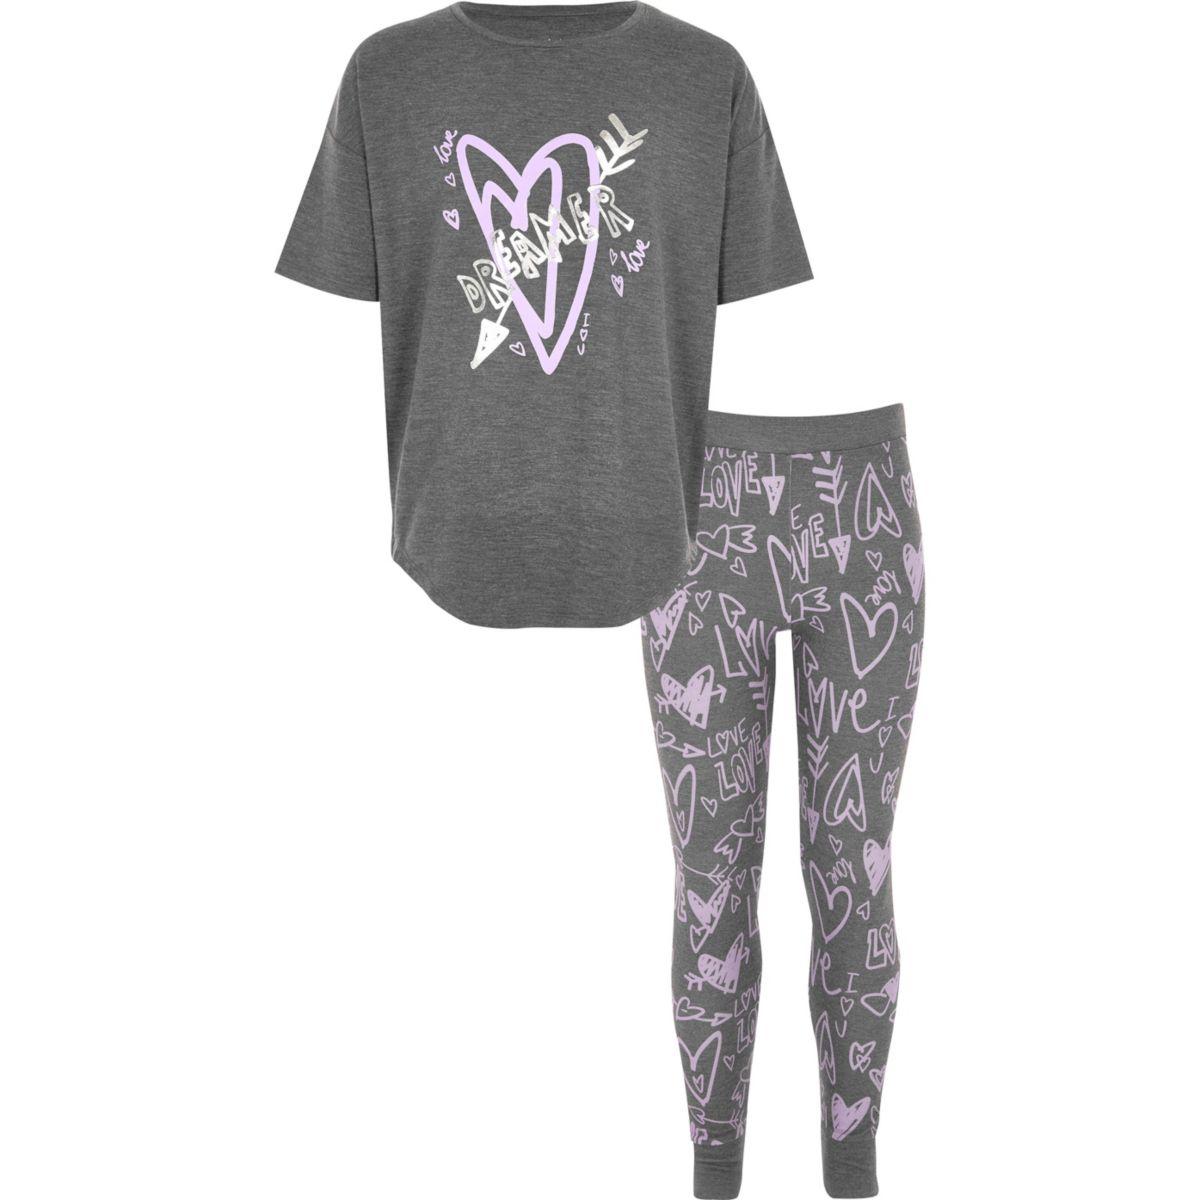 Grauer Pyjama mit Graffiti-Muster